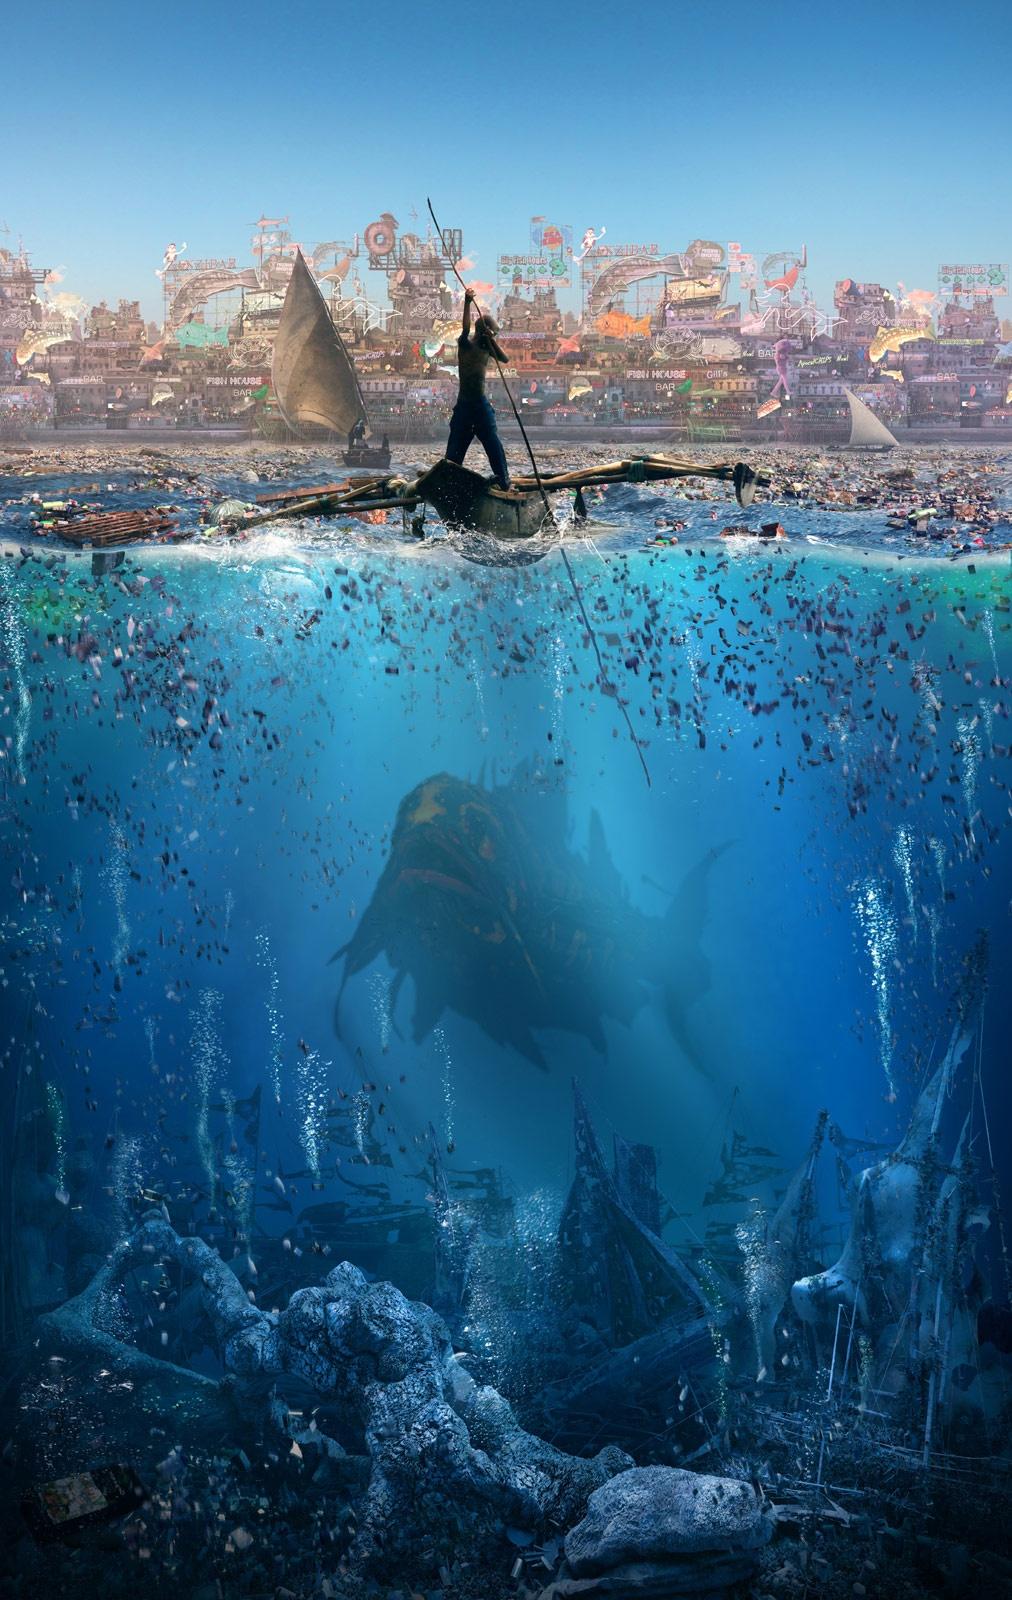 Jonah - Poster by Paul Nicholls